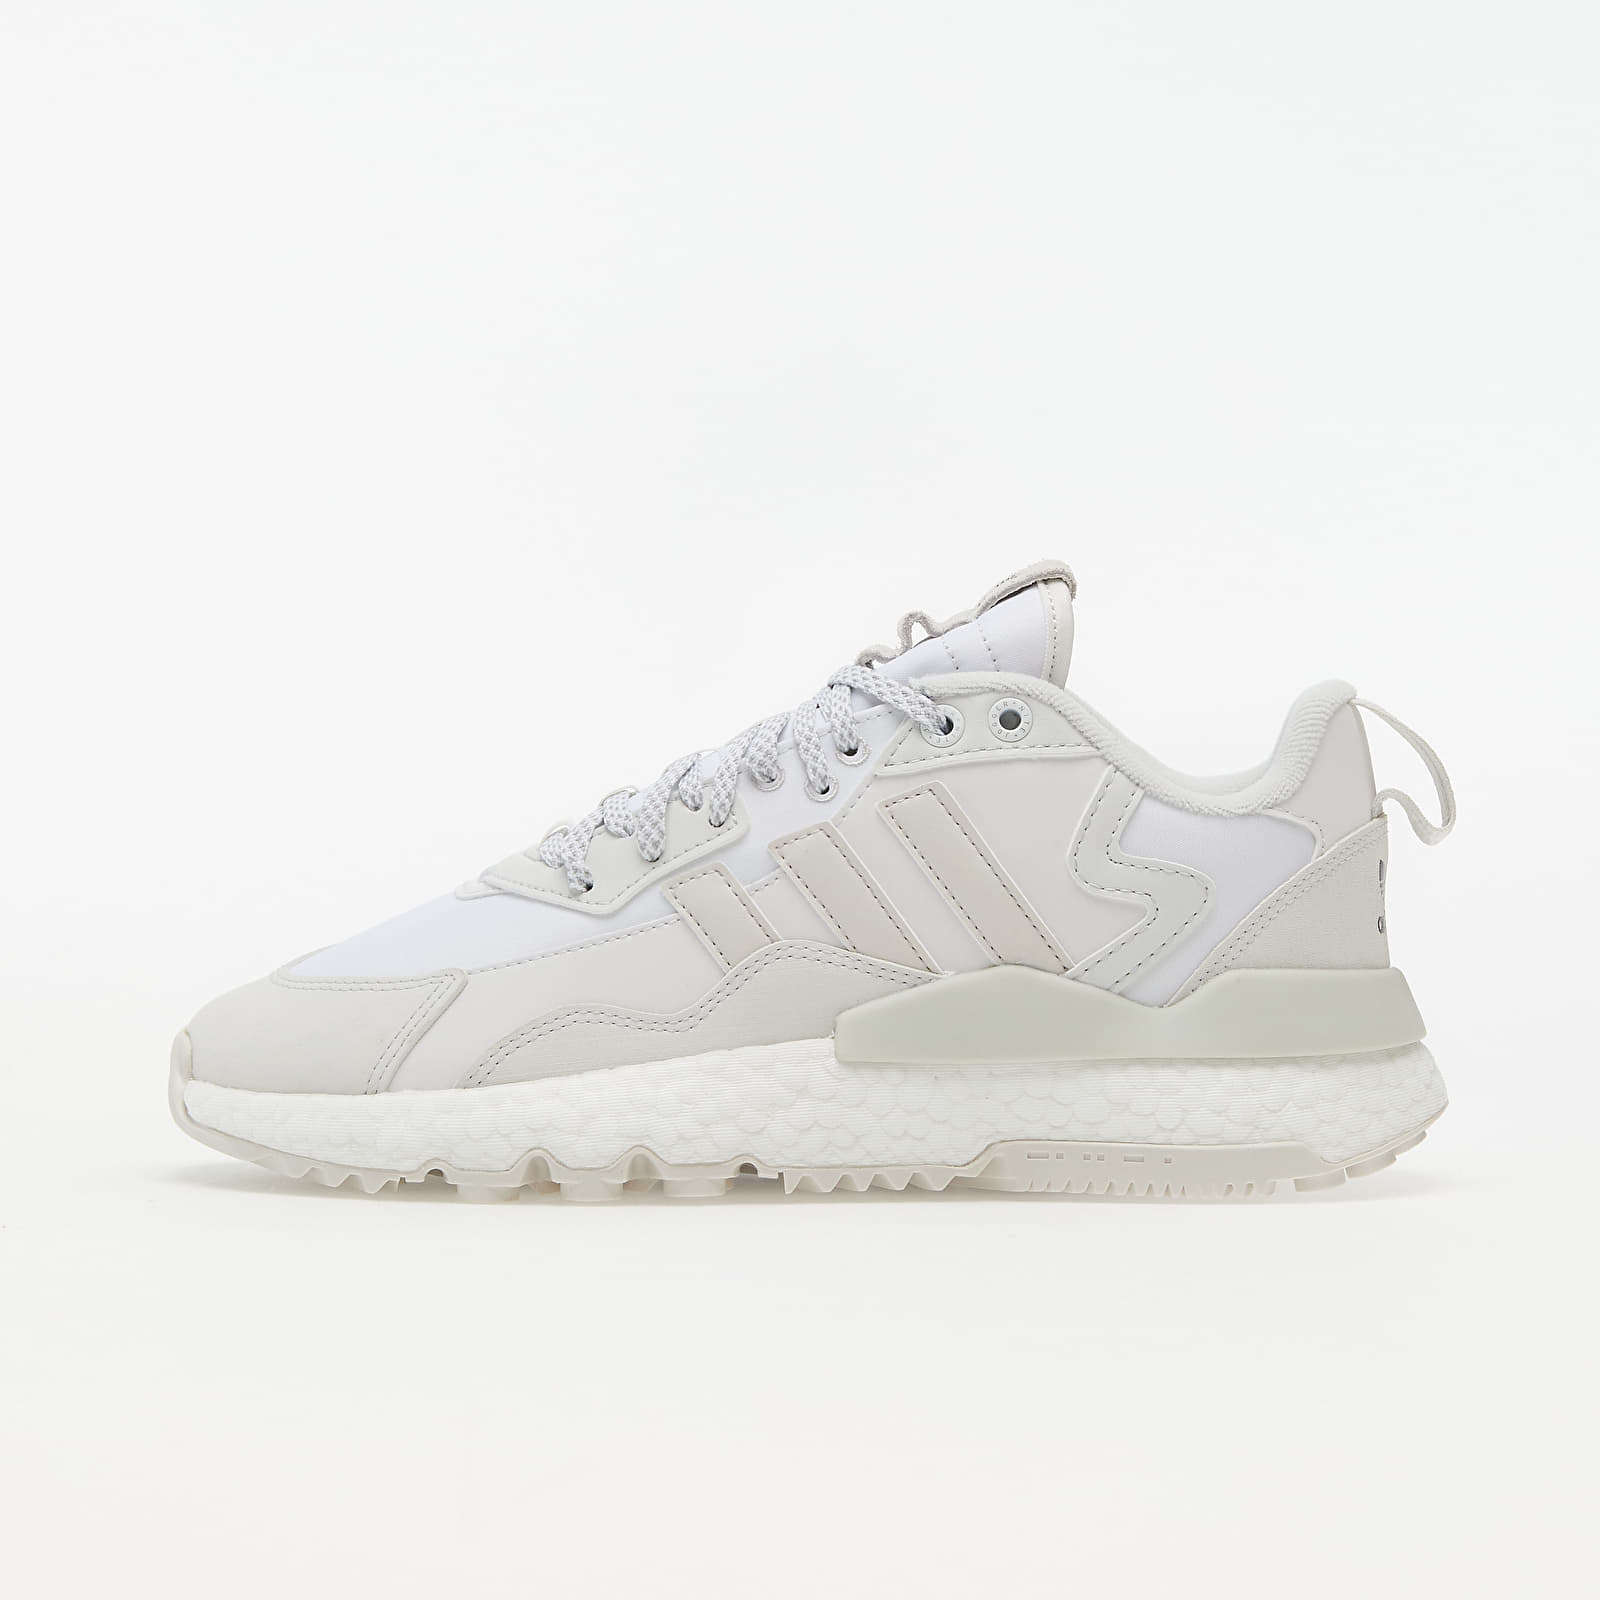 adidas Nite Jogger Winterized Crystal White/ Ftwr White/ Core Black | Footshop